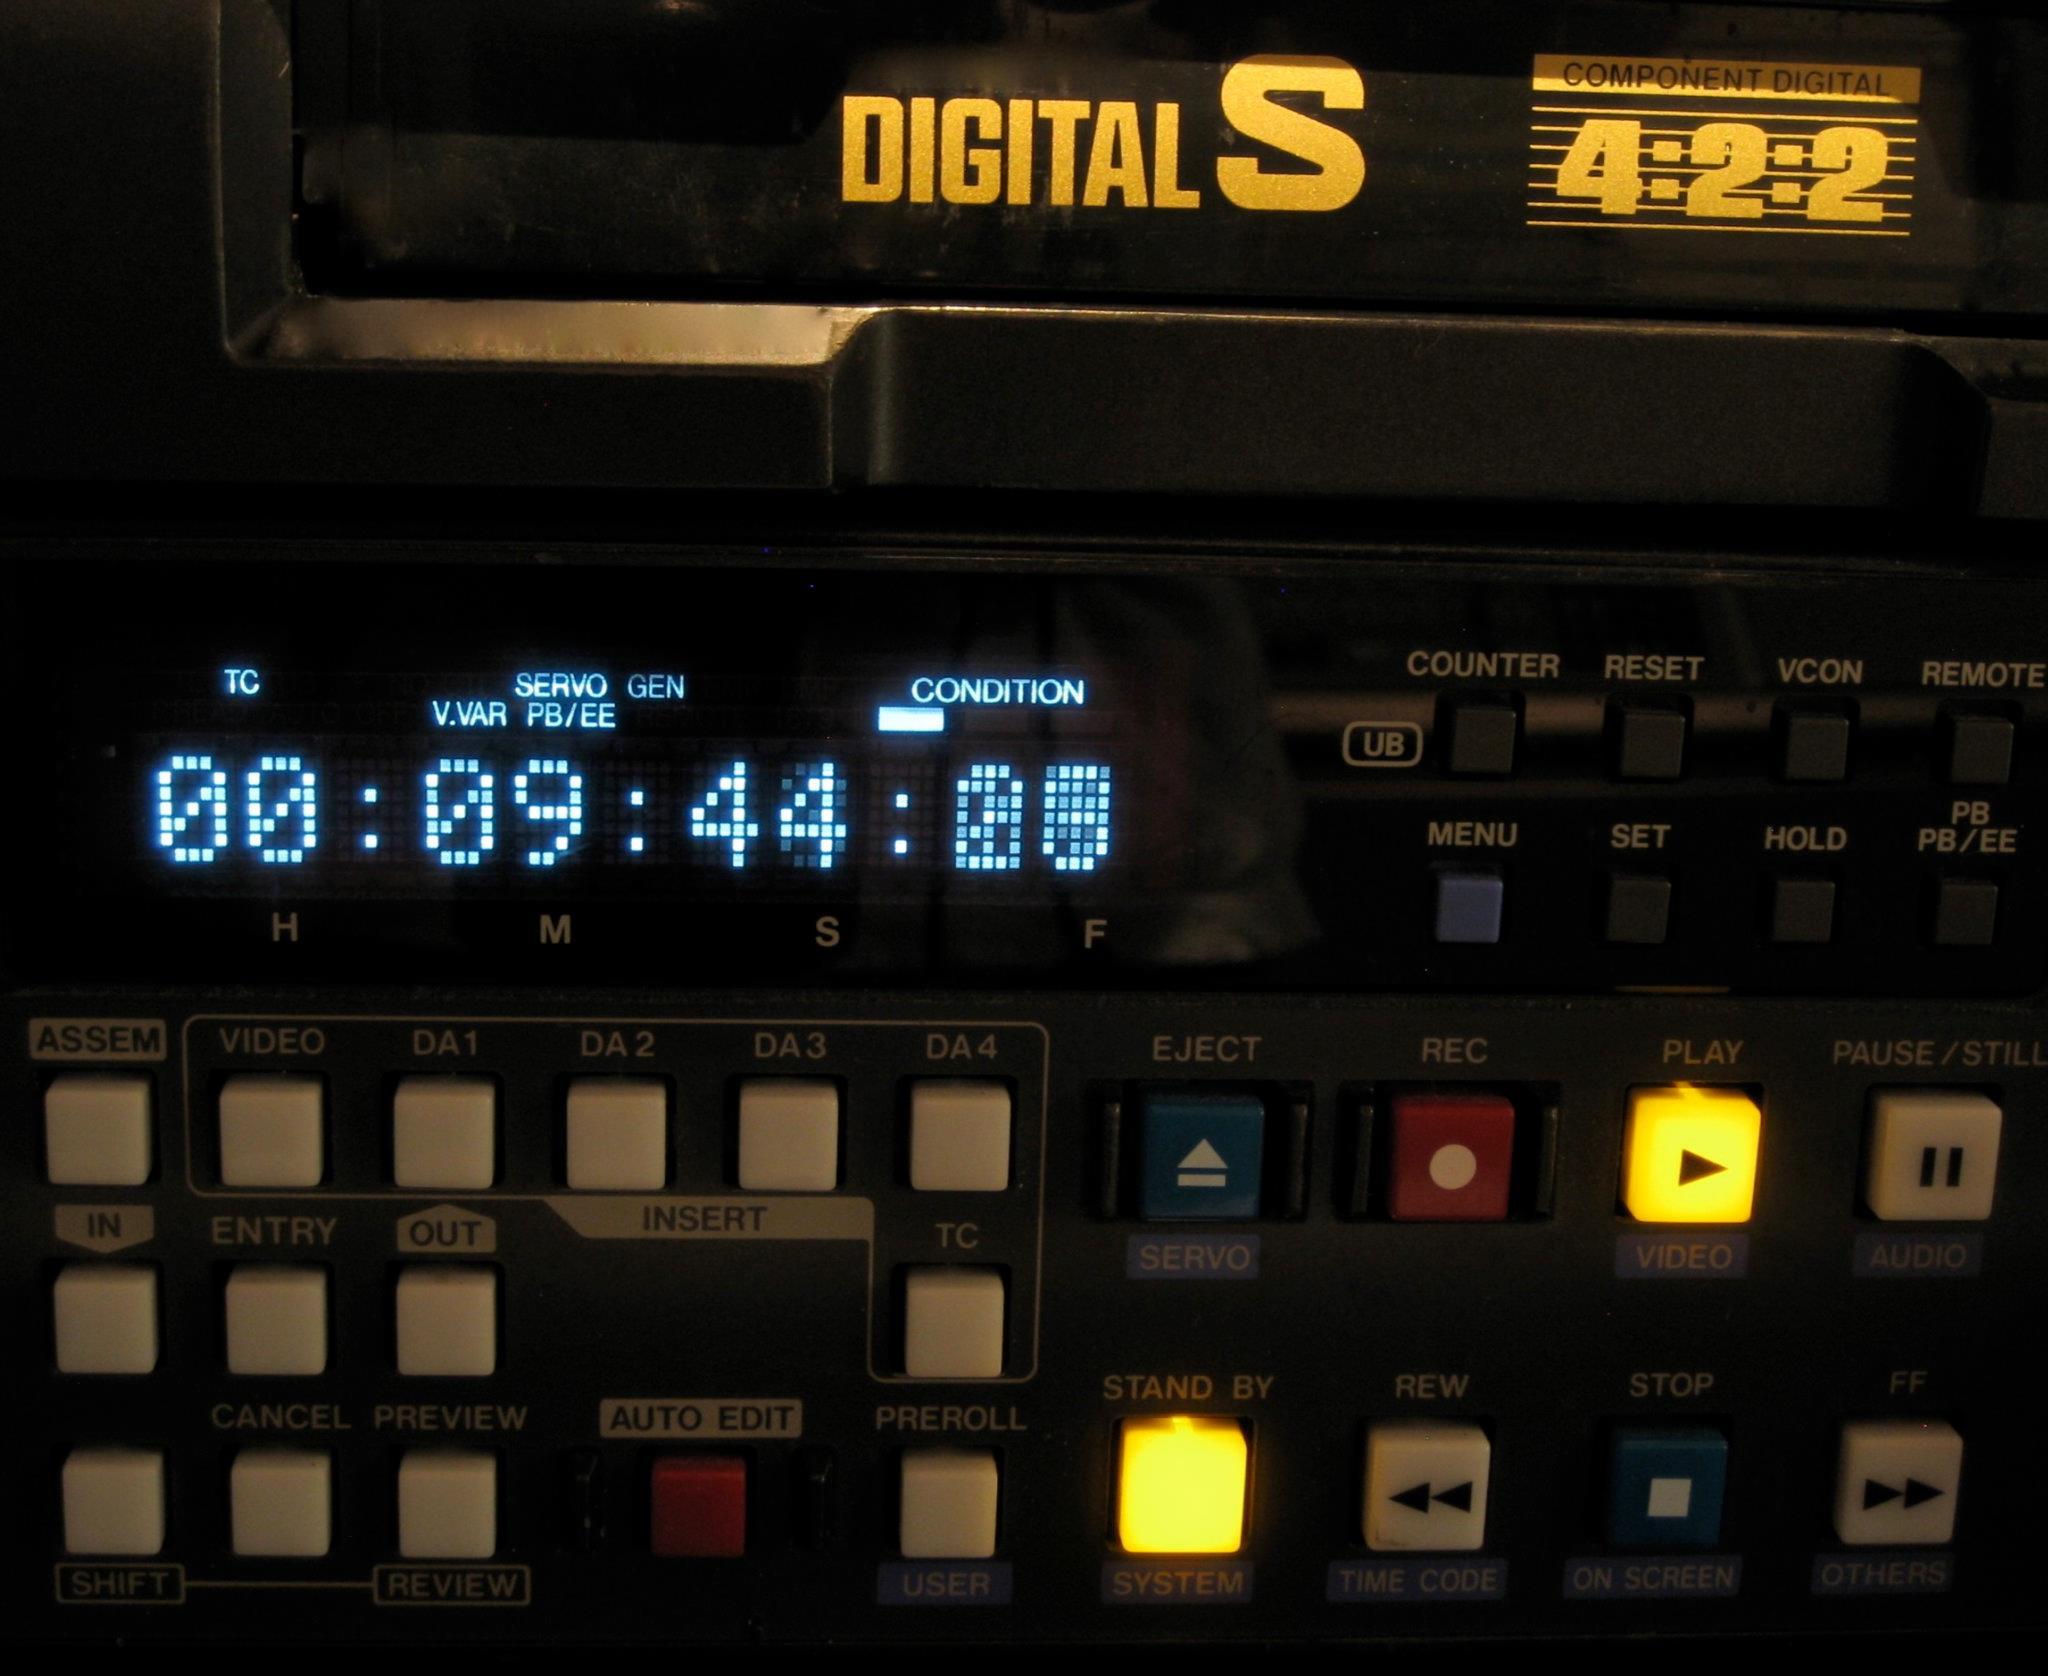 Digital S VHS JVC